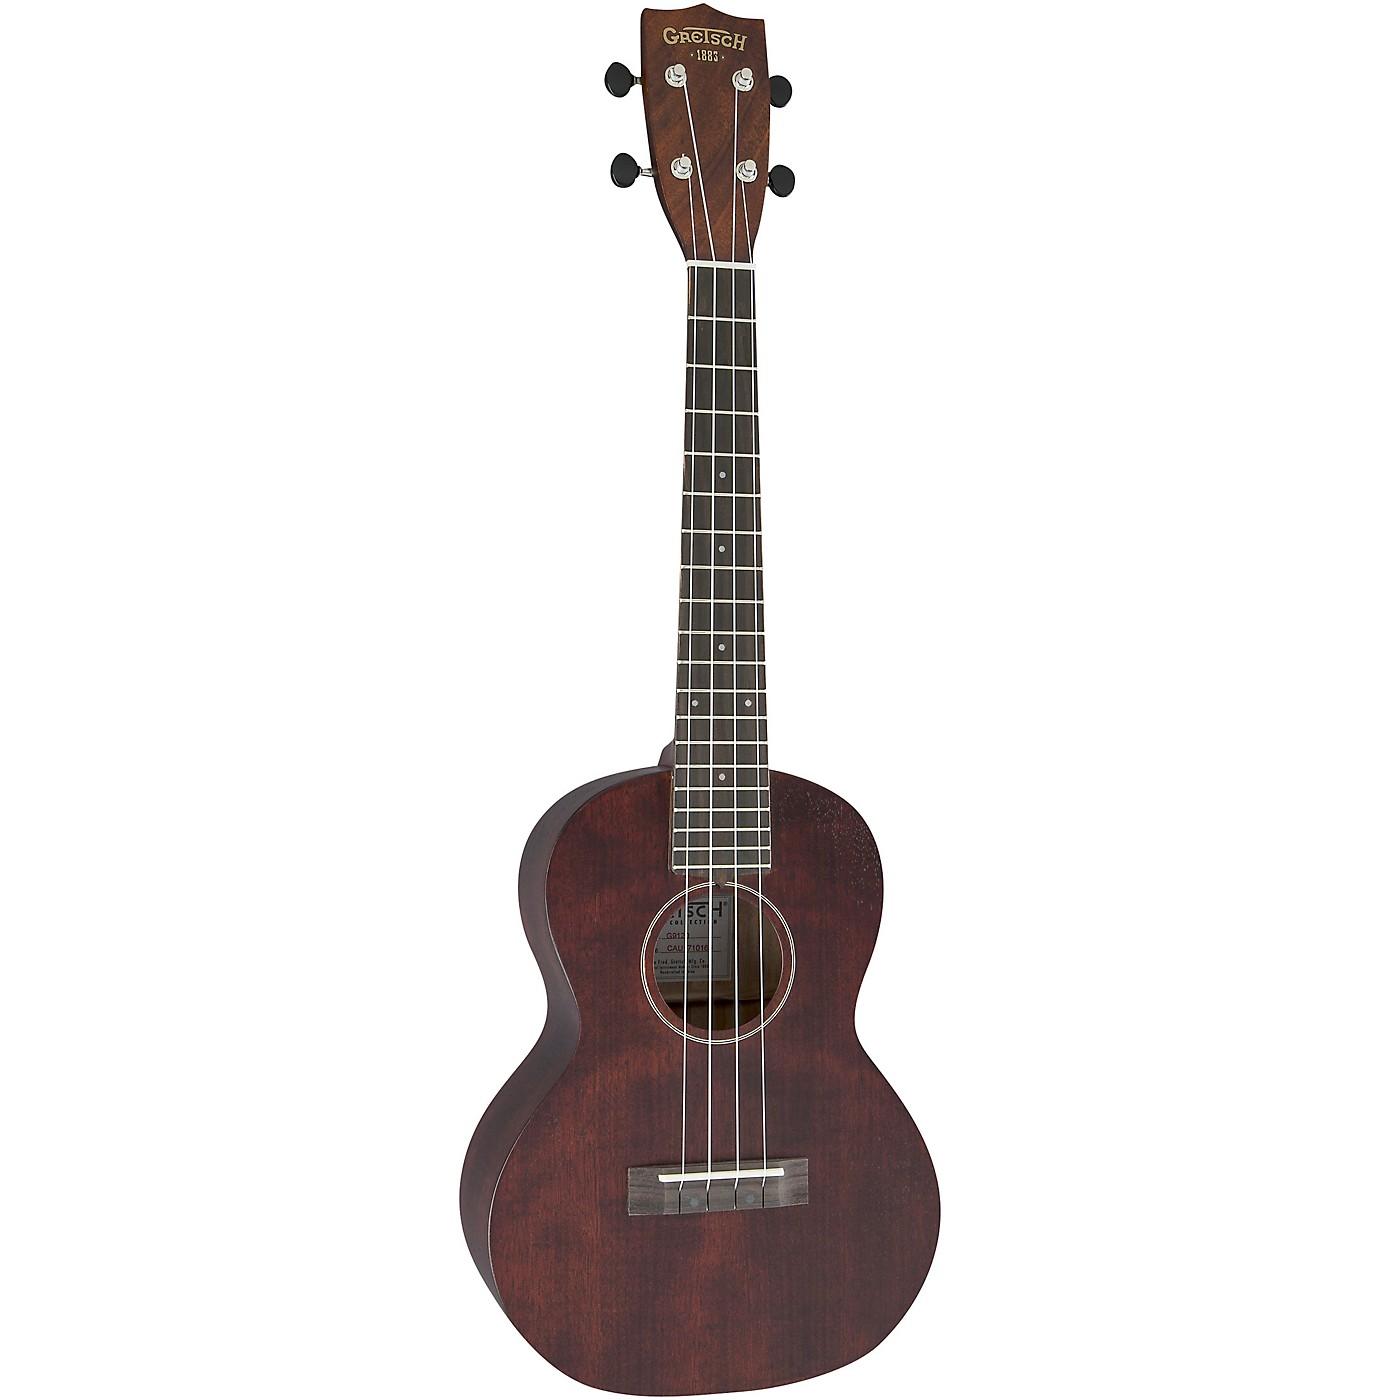 Gretsch Guitars G9120 Tenor Standard Ukulele thumbnail